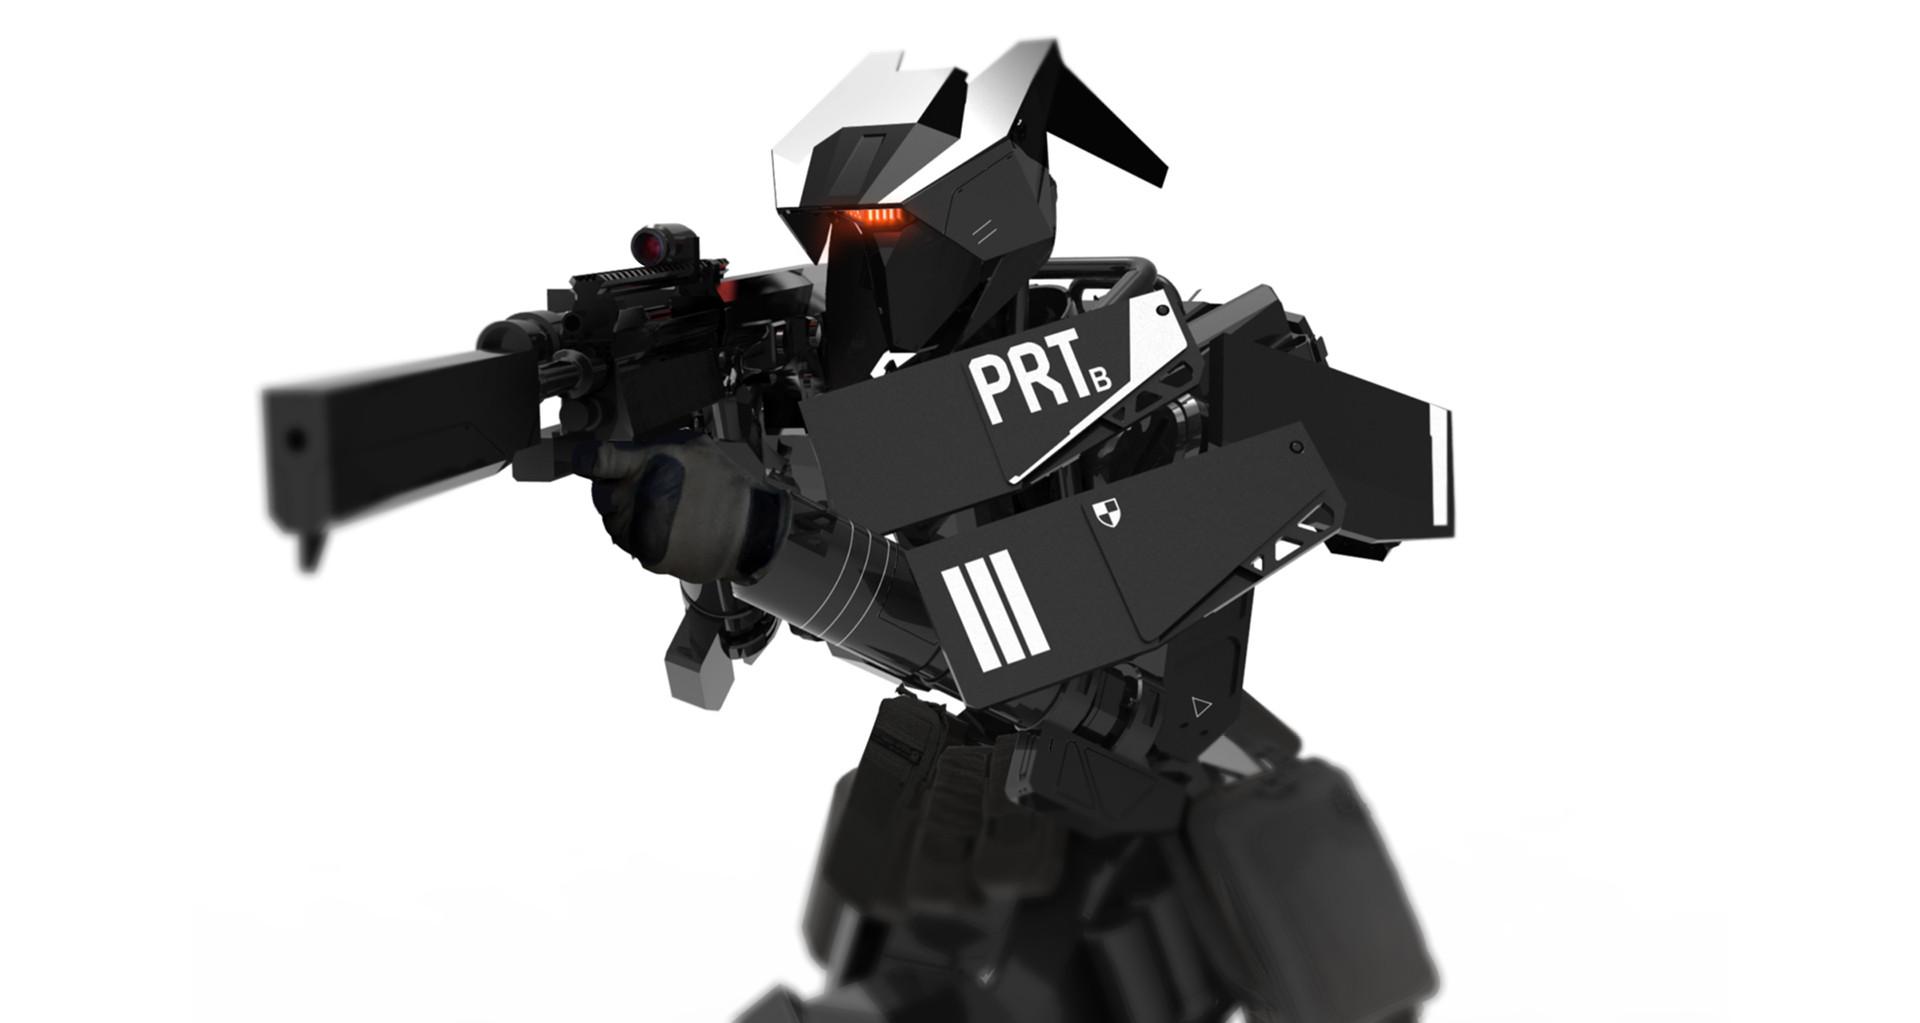 PRTR_02.jpg